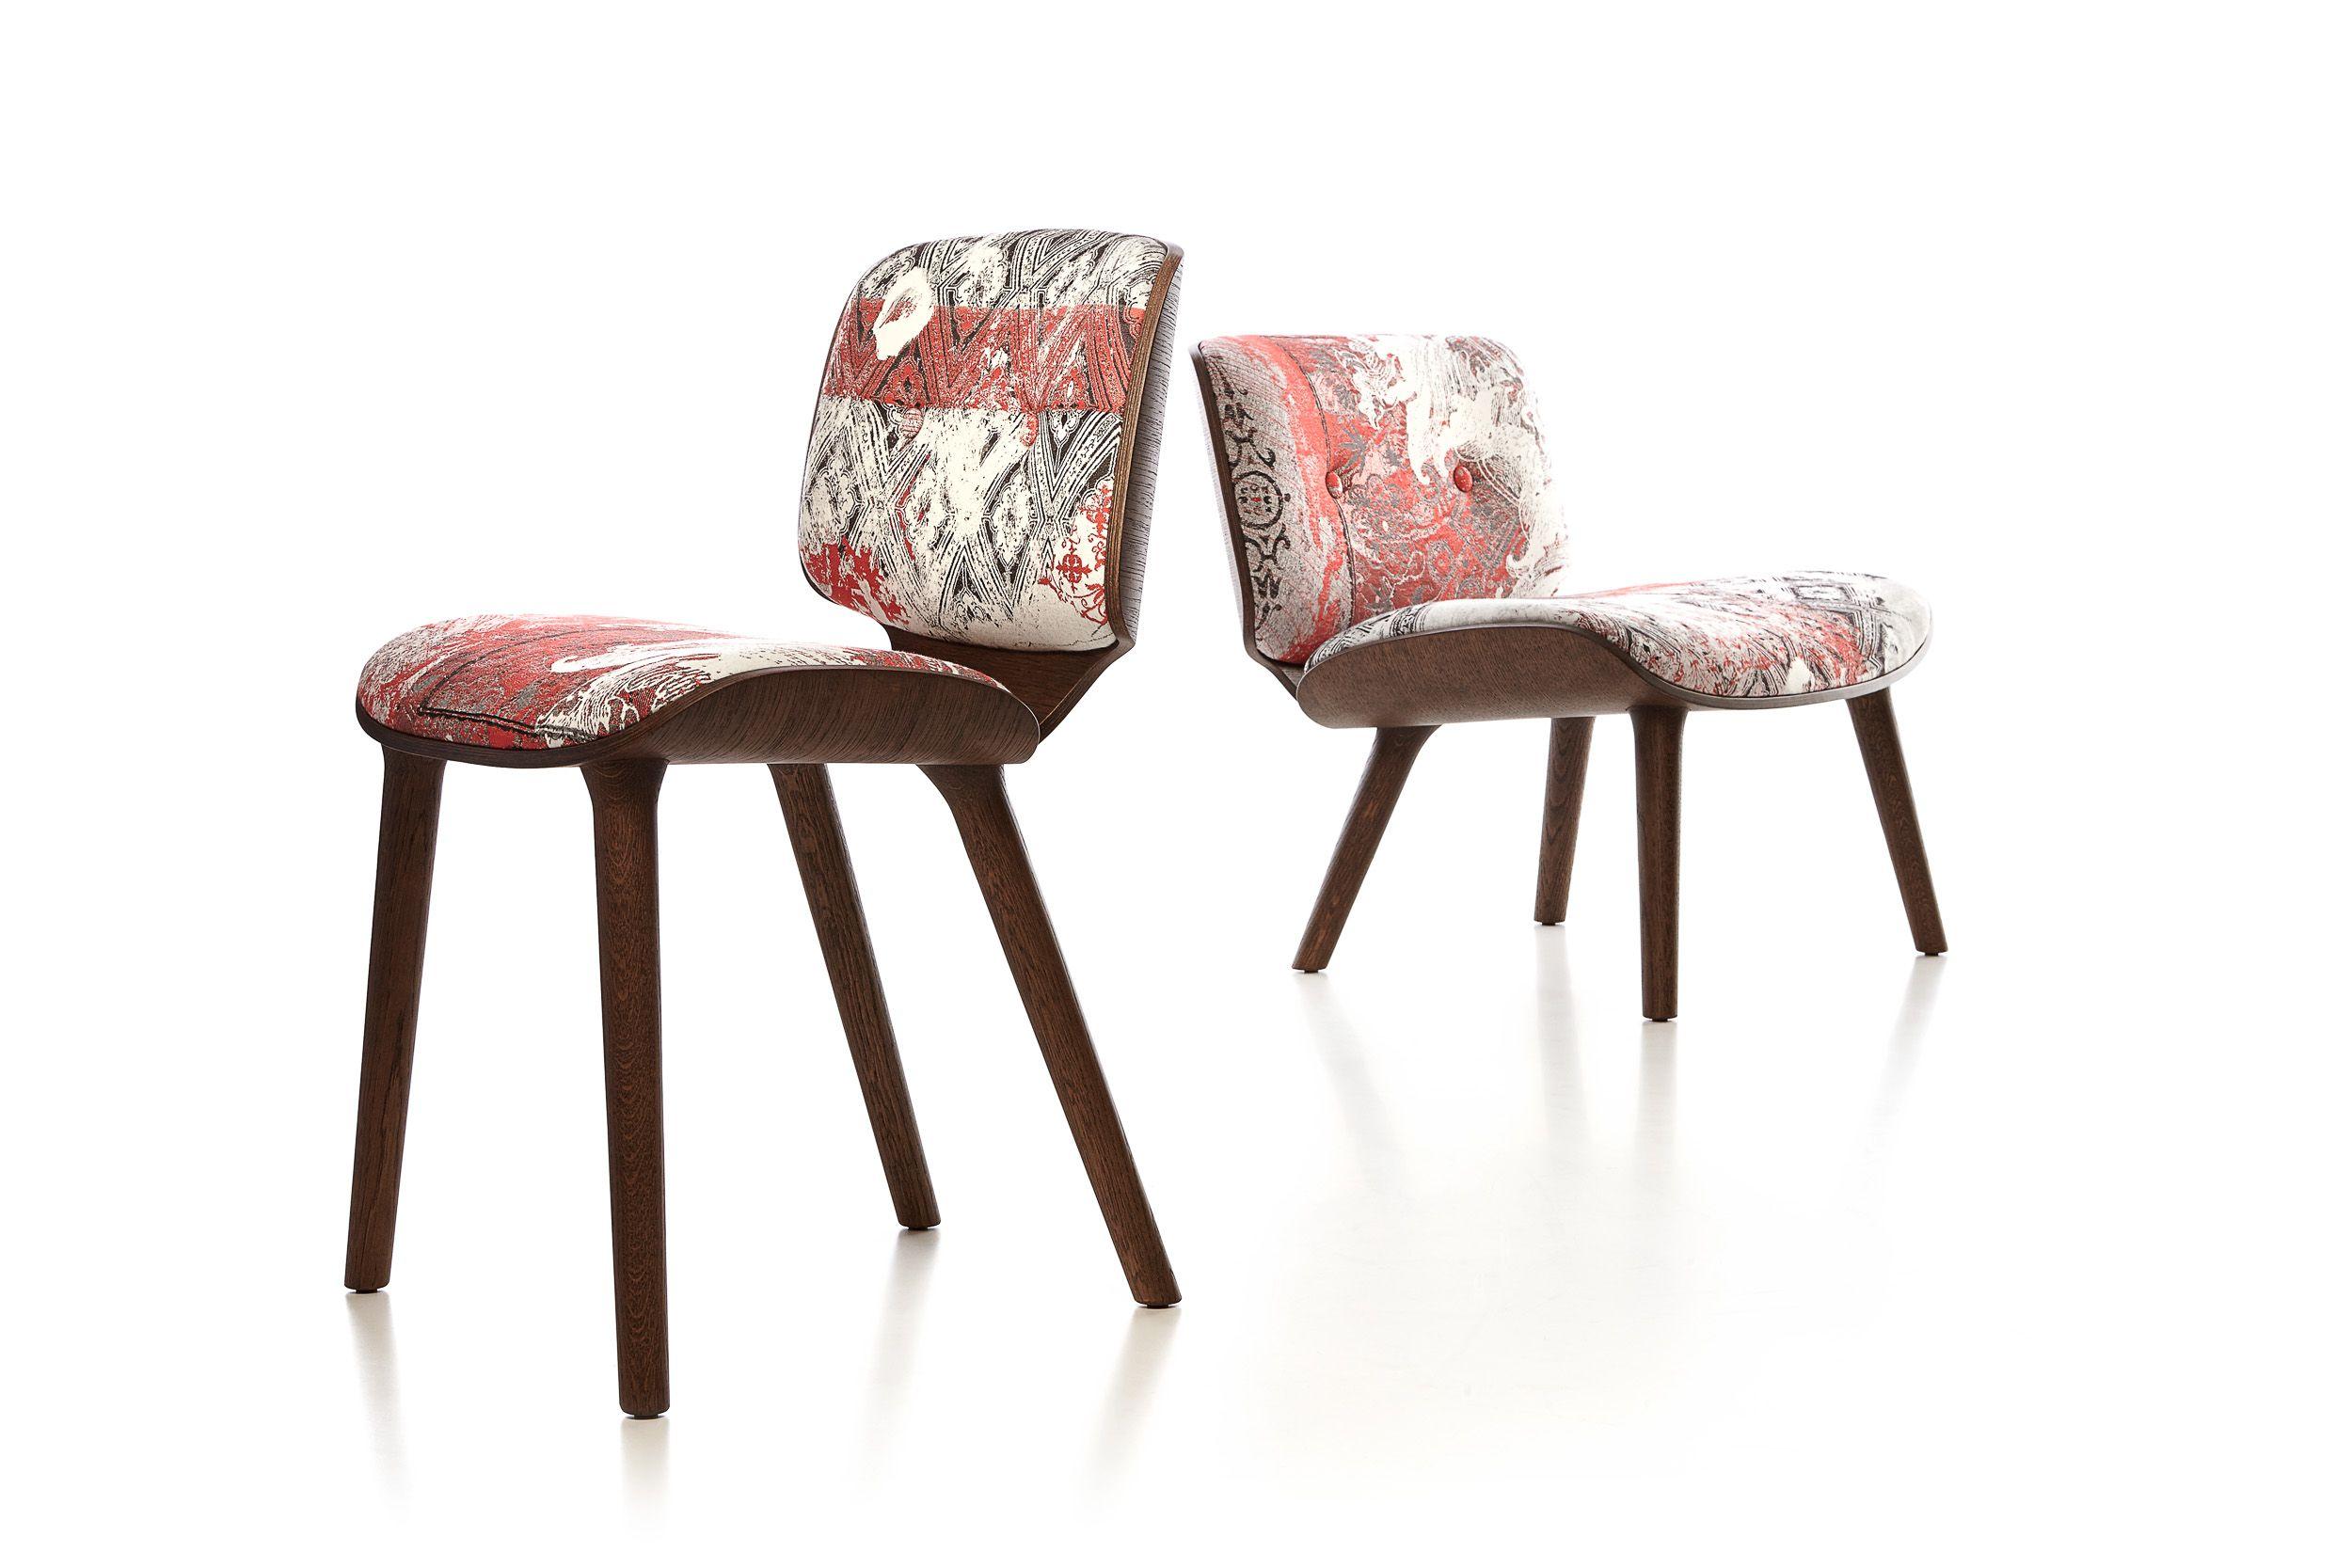 nut-lounge-chair-067_last-forweb-moooi_0